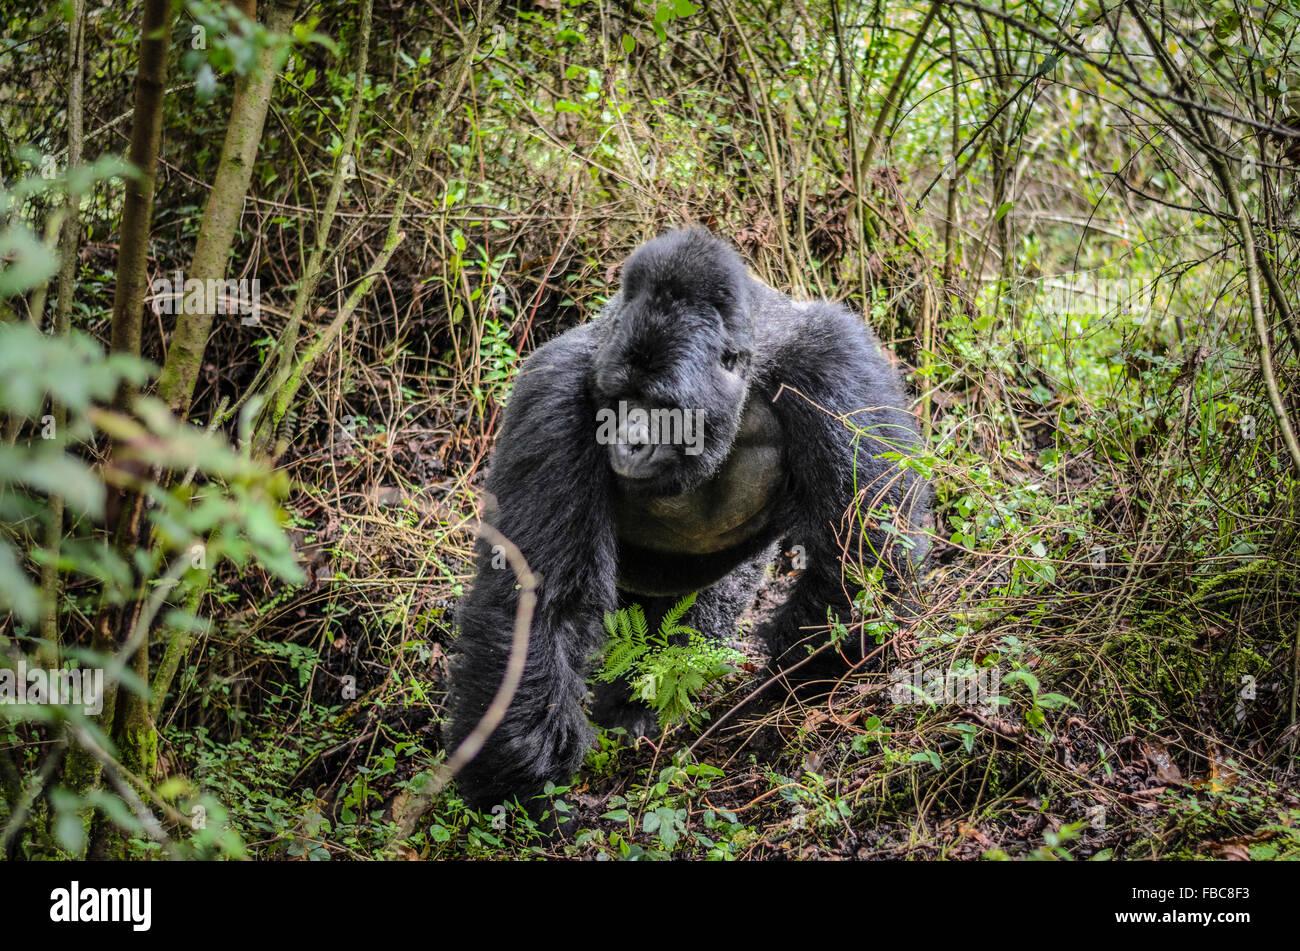 Silverback, Mountain Gorilla, Mgahinga Gorilla National Park, Uganda - Stock Image